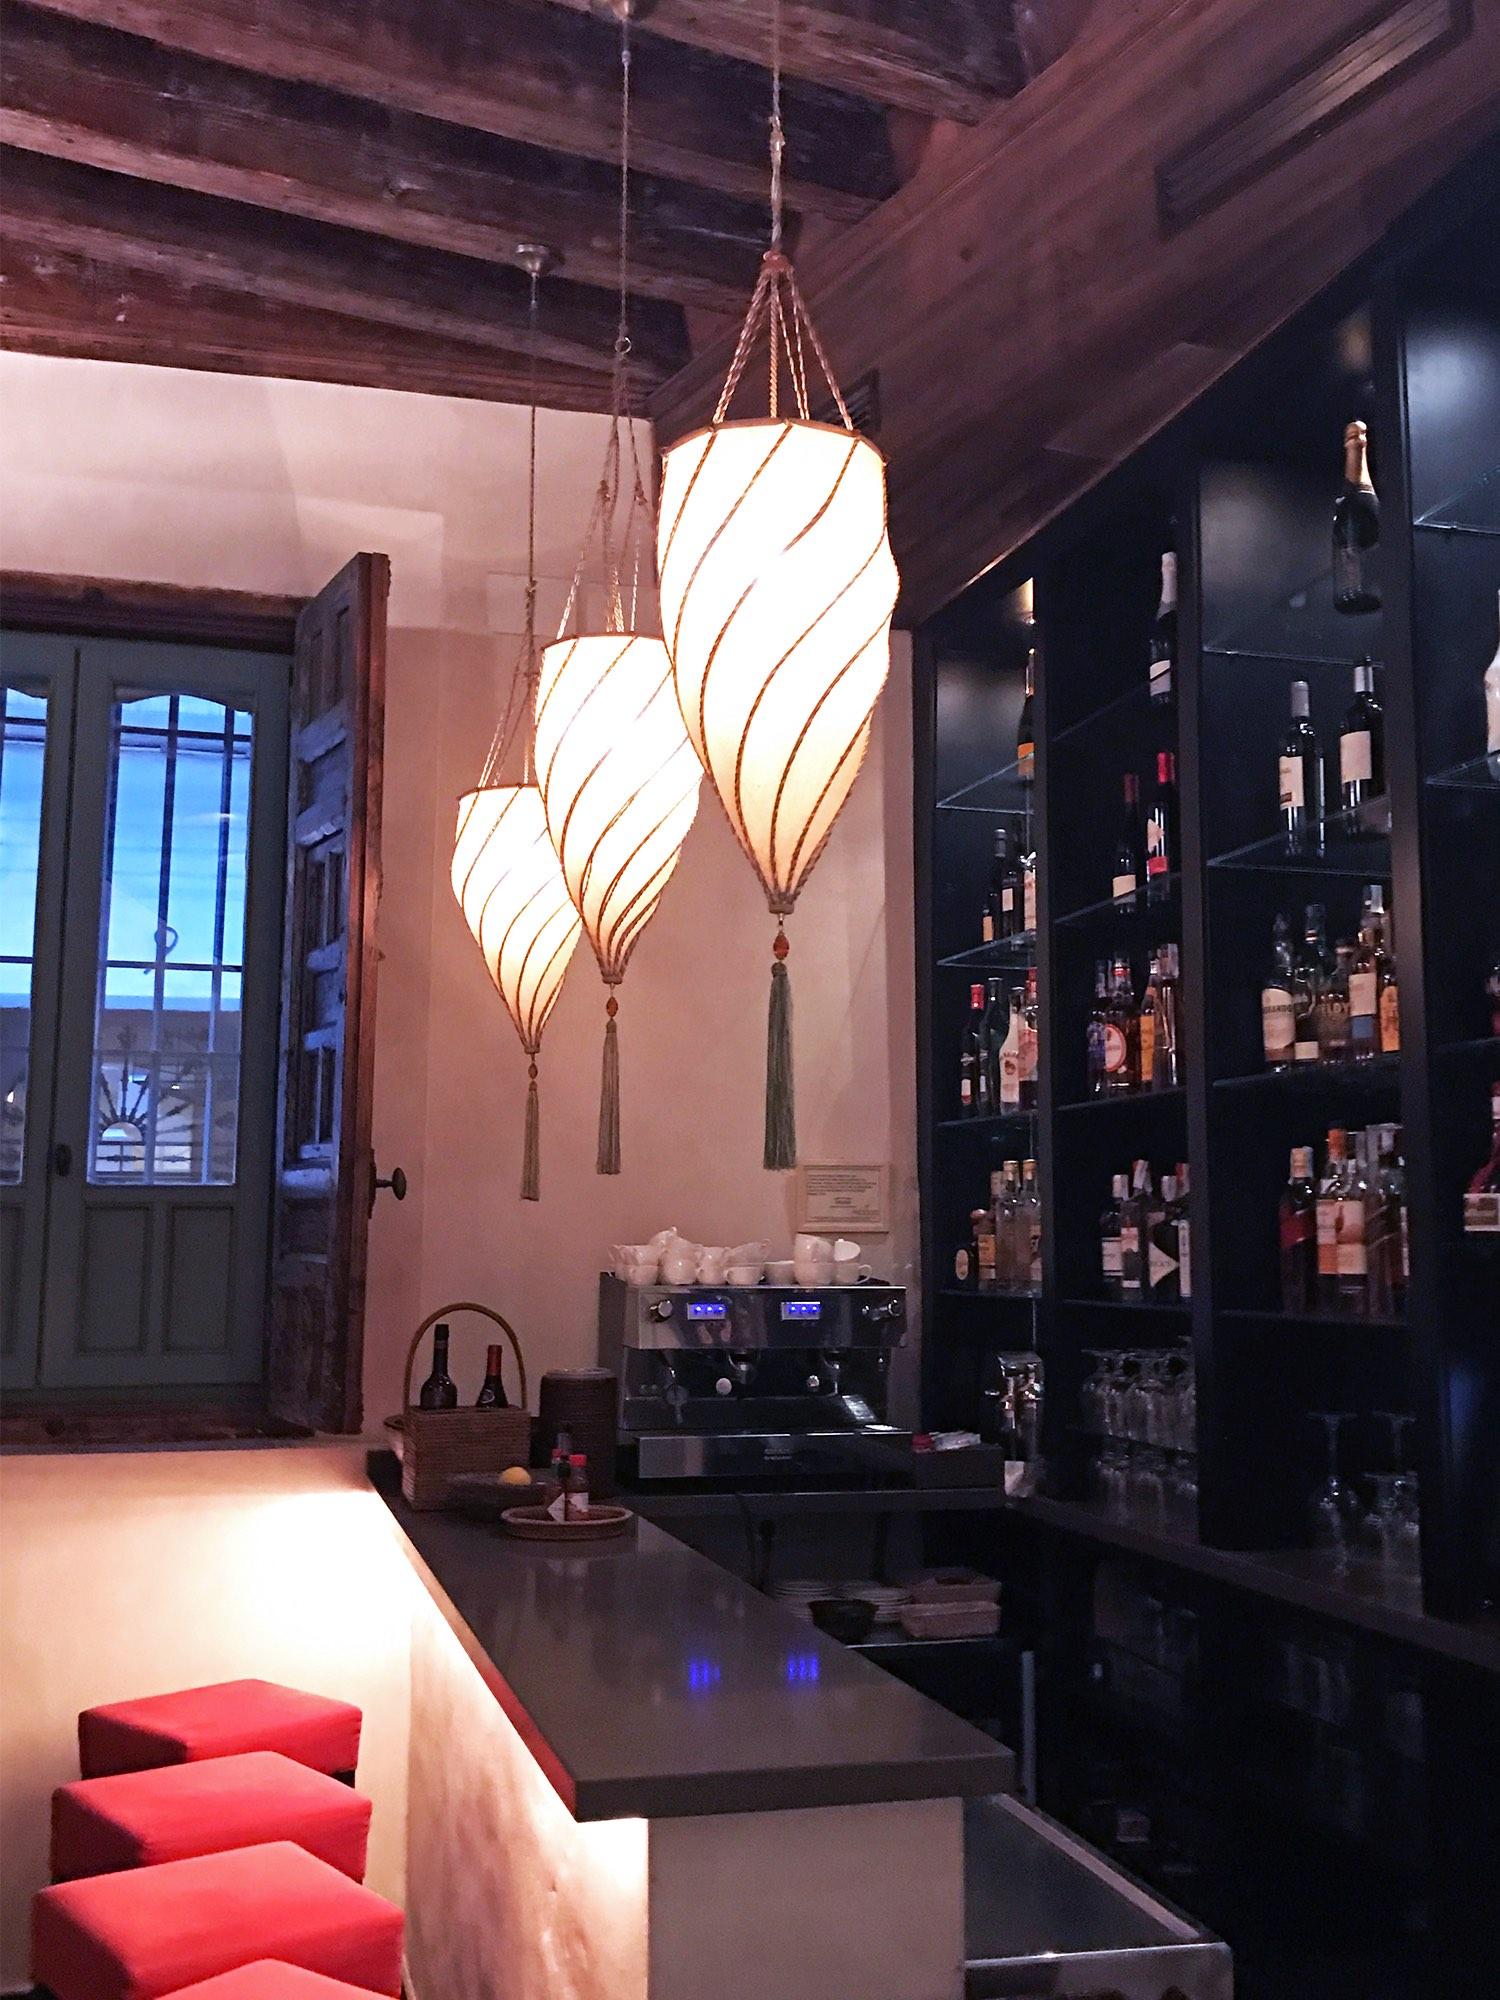 Corral del Rey hotel Seville Spain bar.jpg